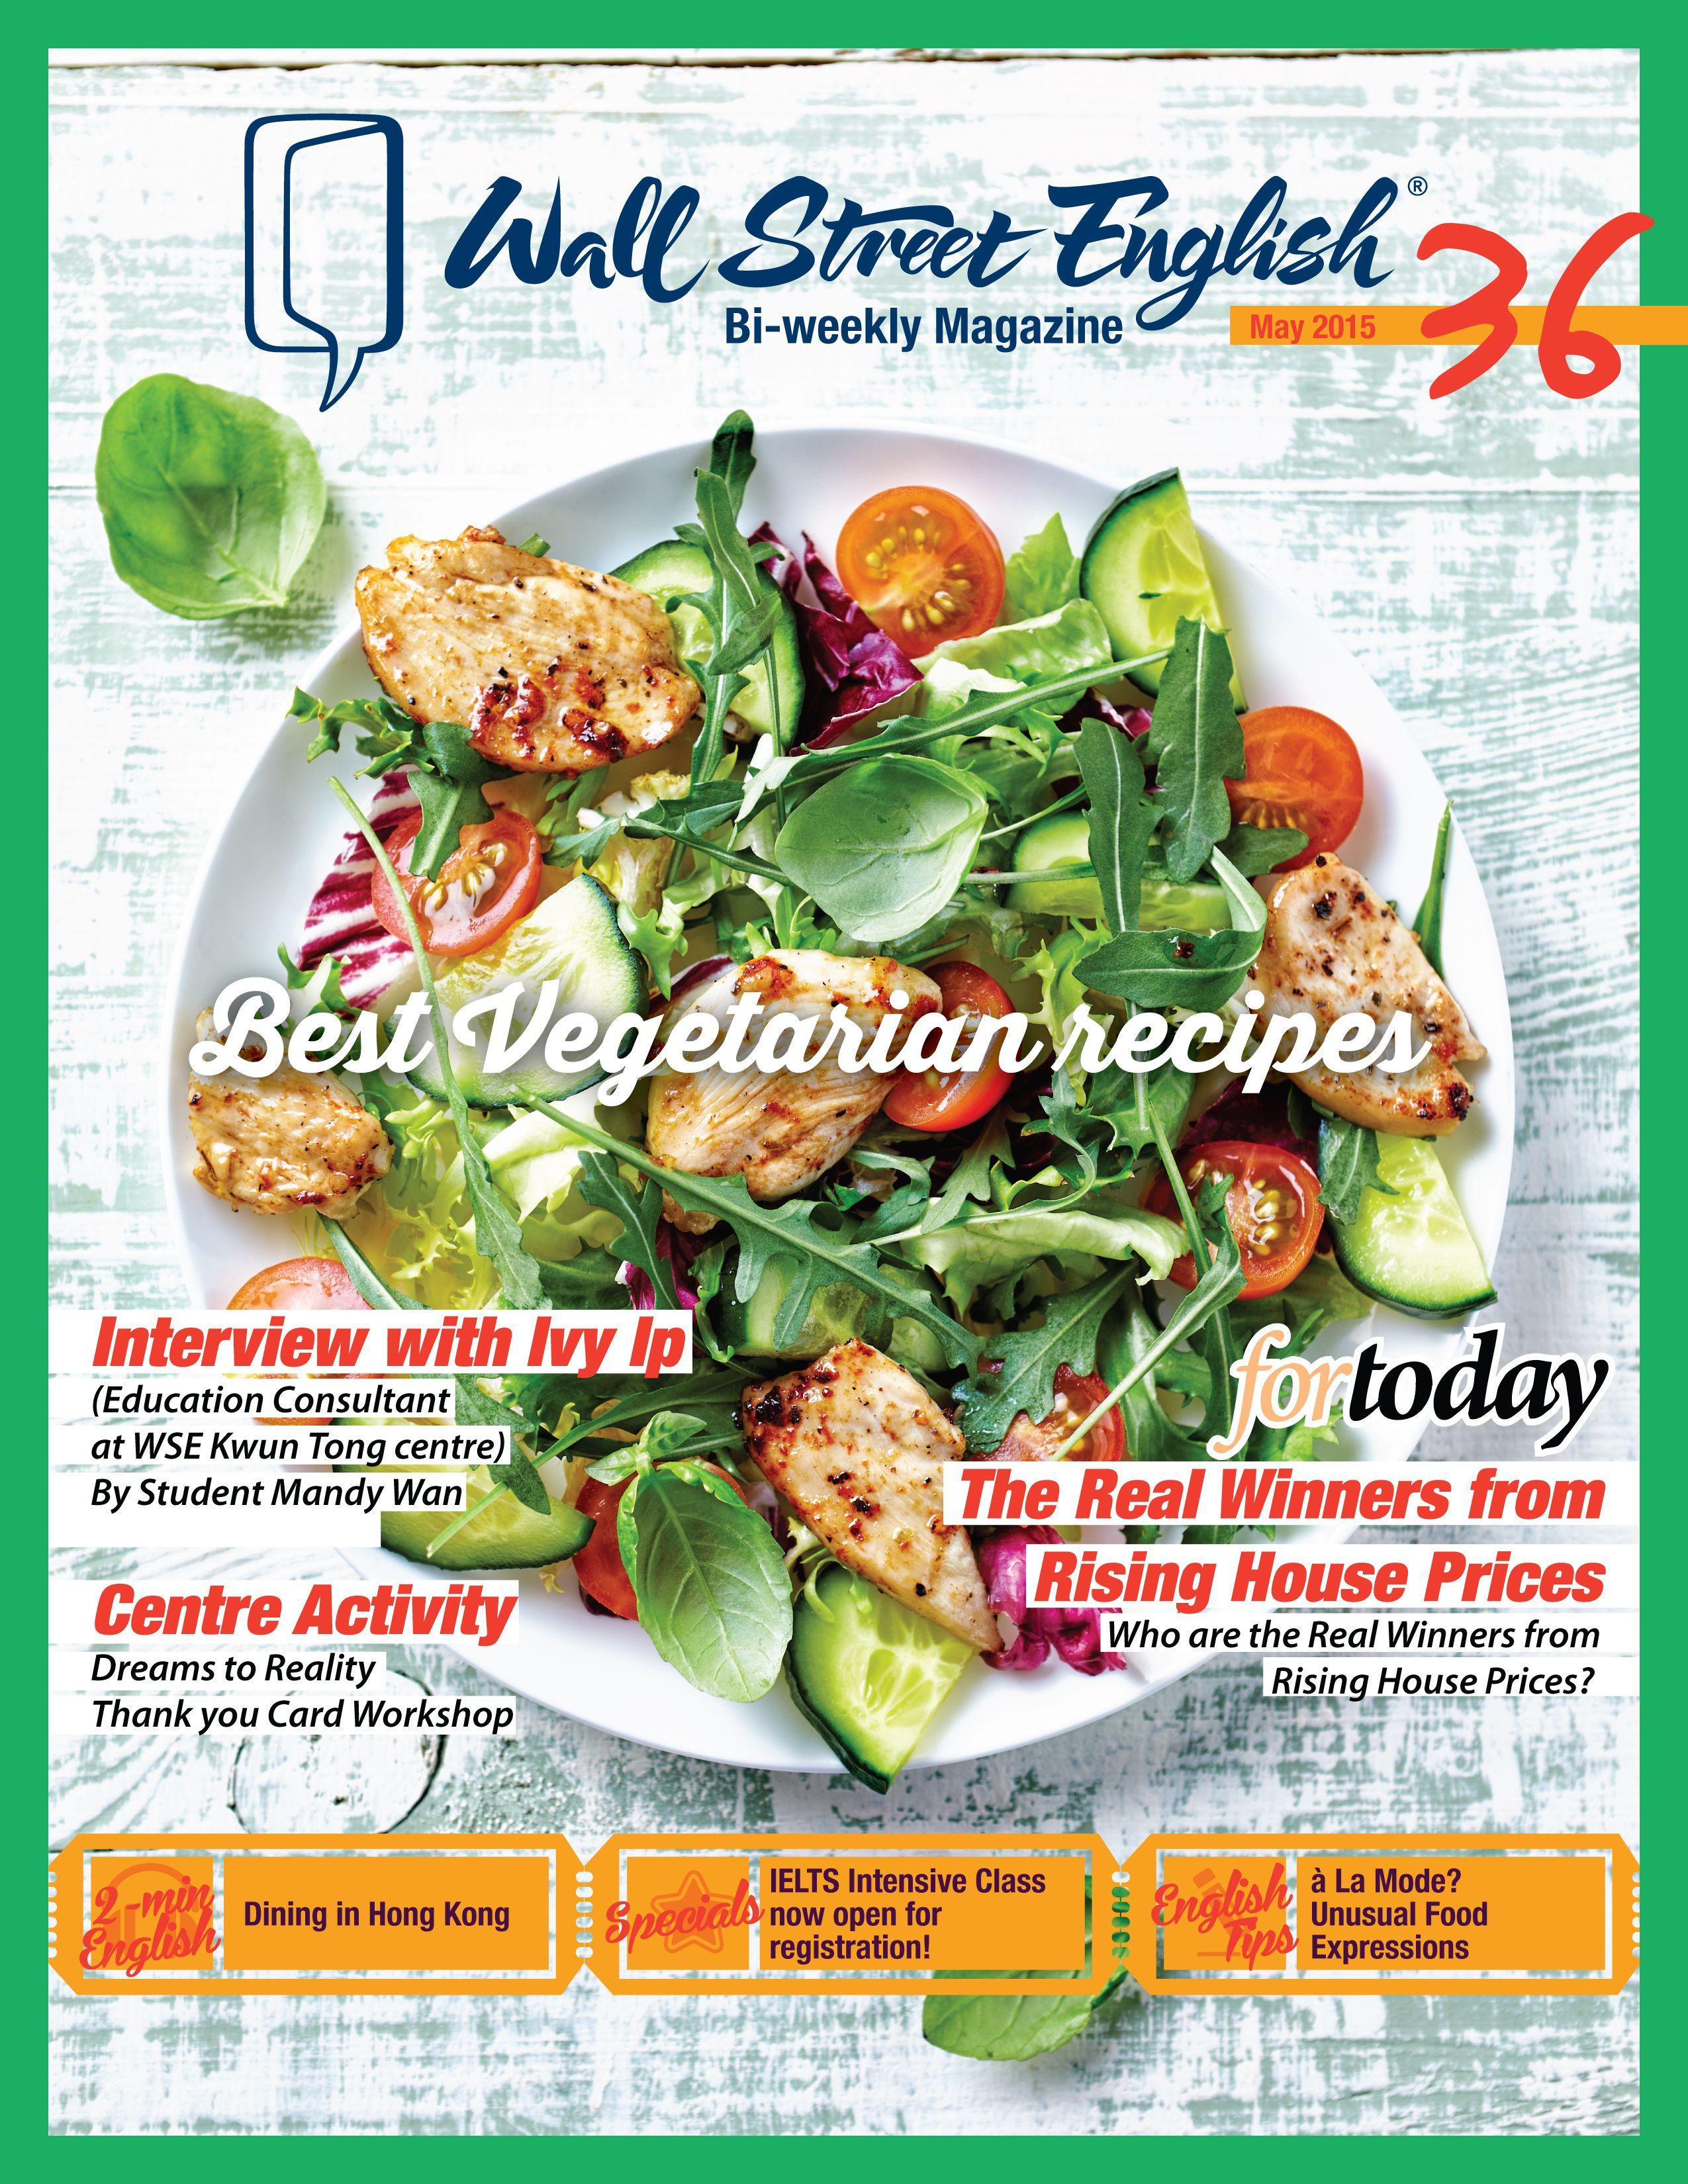 Wall street english bi weekly magazine no36 best vegetarian wall street english bi weekly magazine no36 best vegetarian recipes wsehk forumfinder Gallery